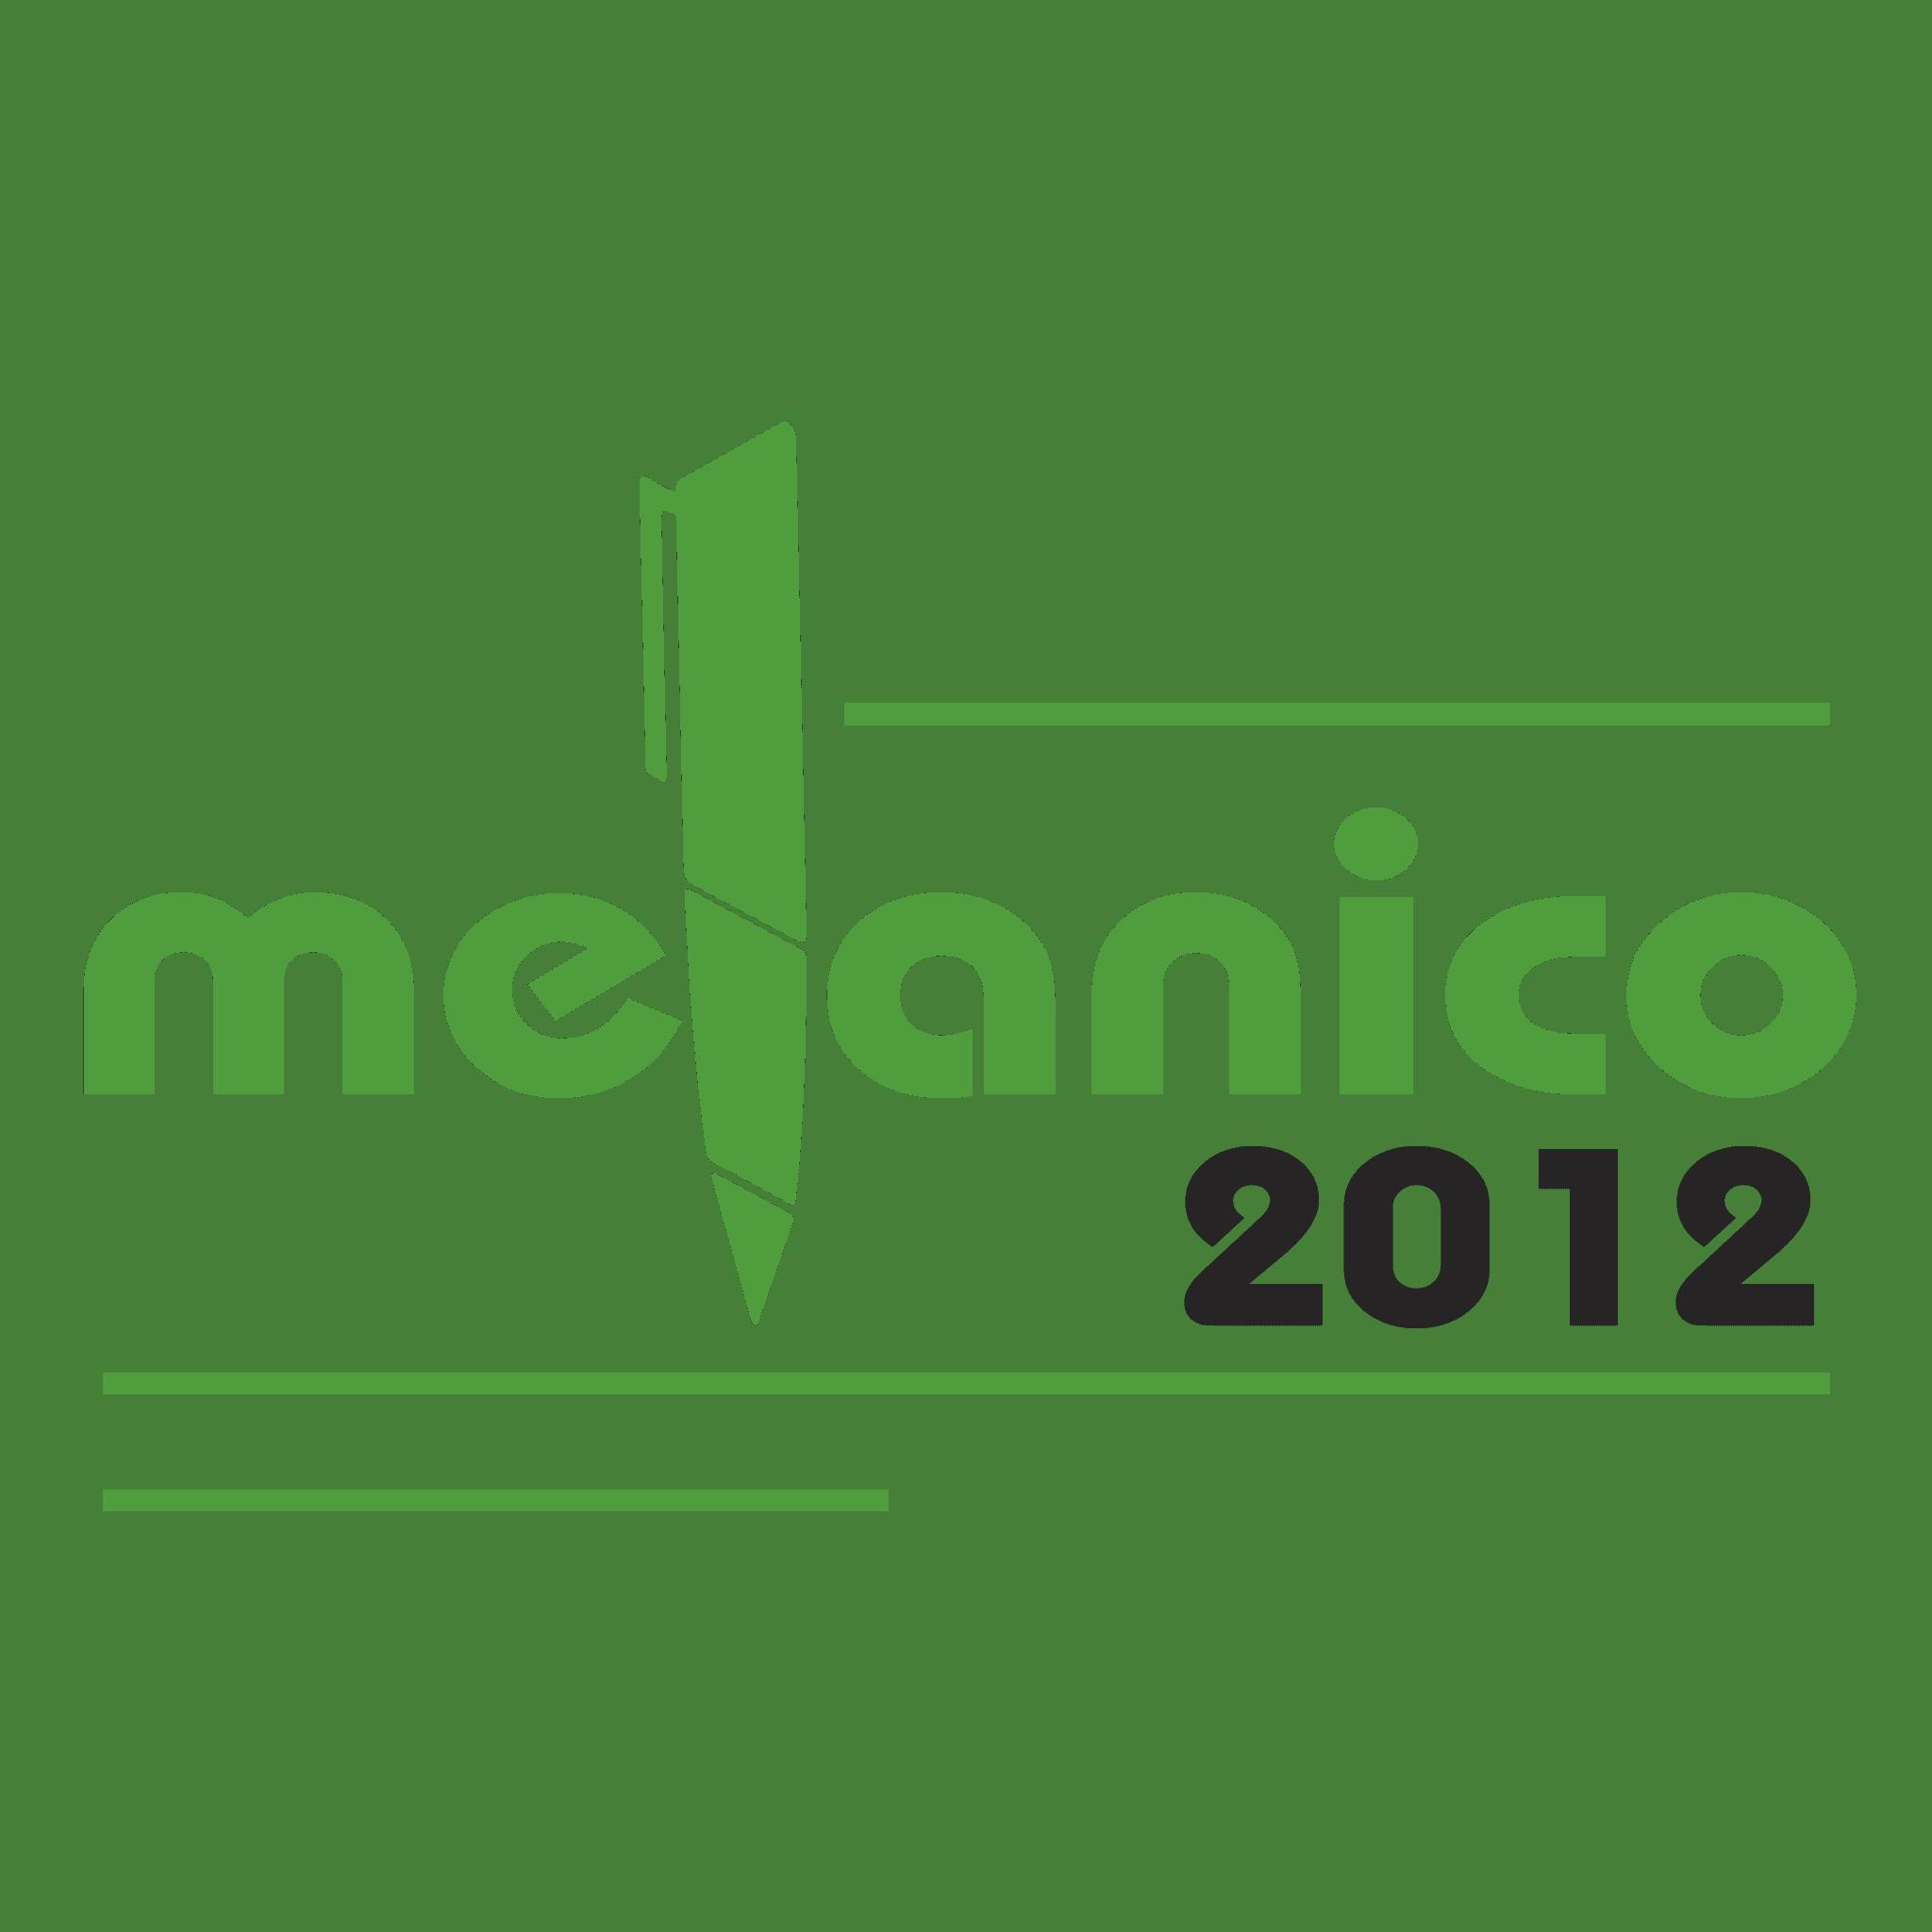 Your Adit Planet Ltd - melanico logo